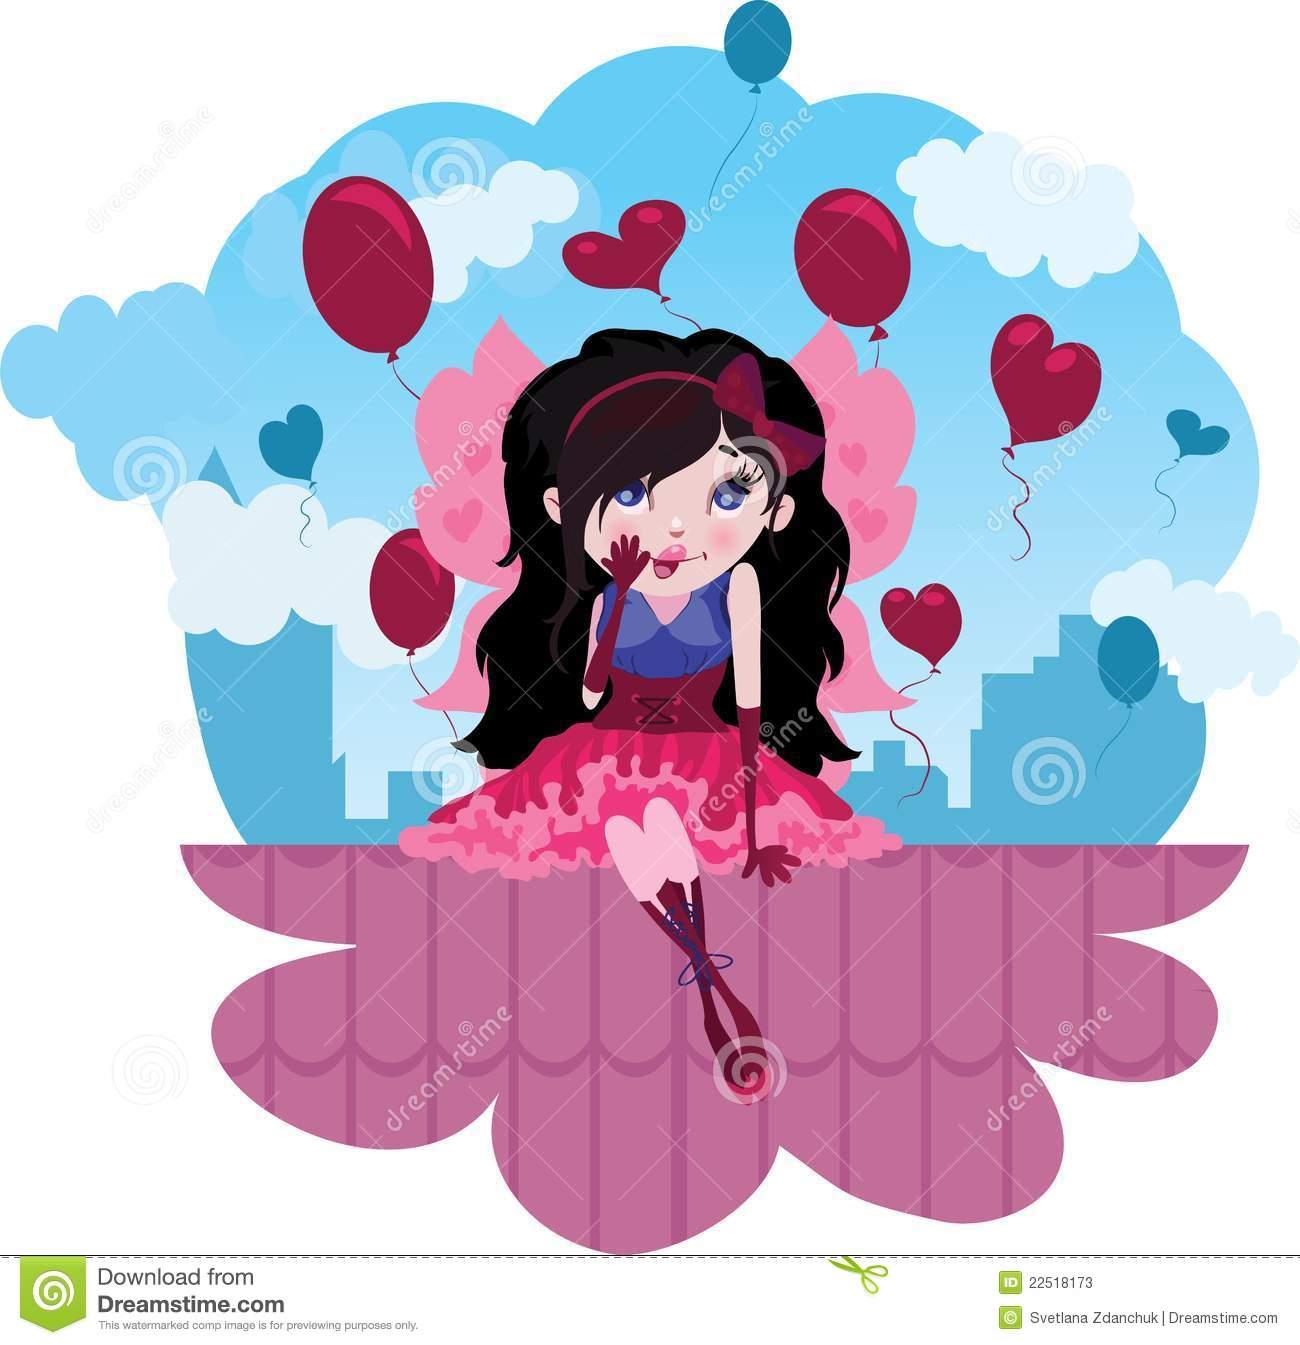 Vetor Feericamente Dos Desenhos Animados Do Amor Bonito Fotos De